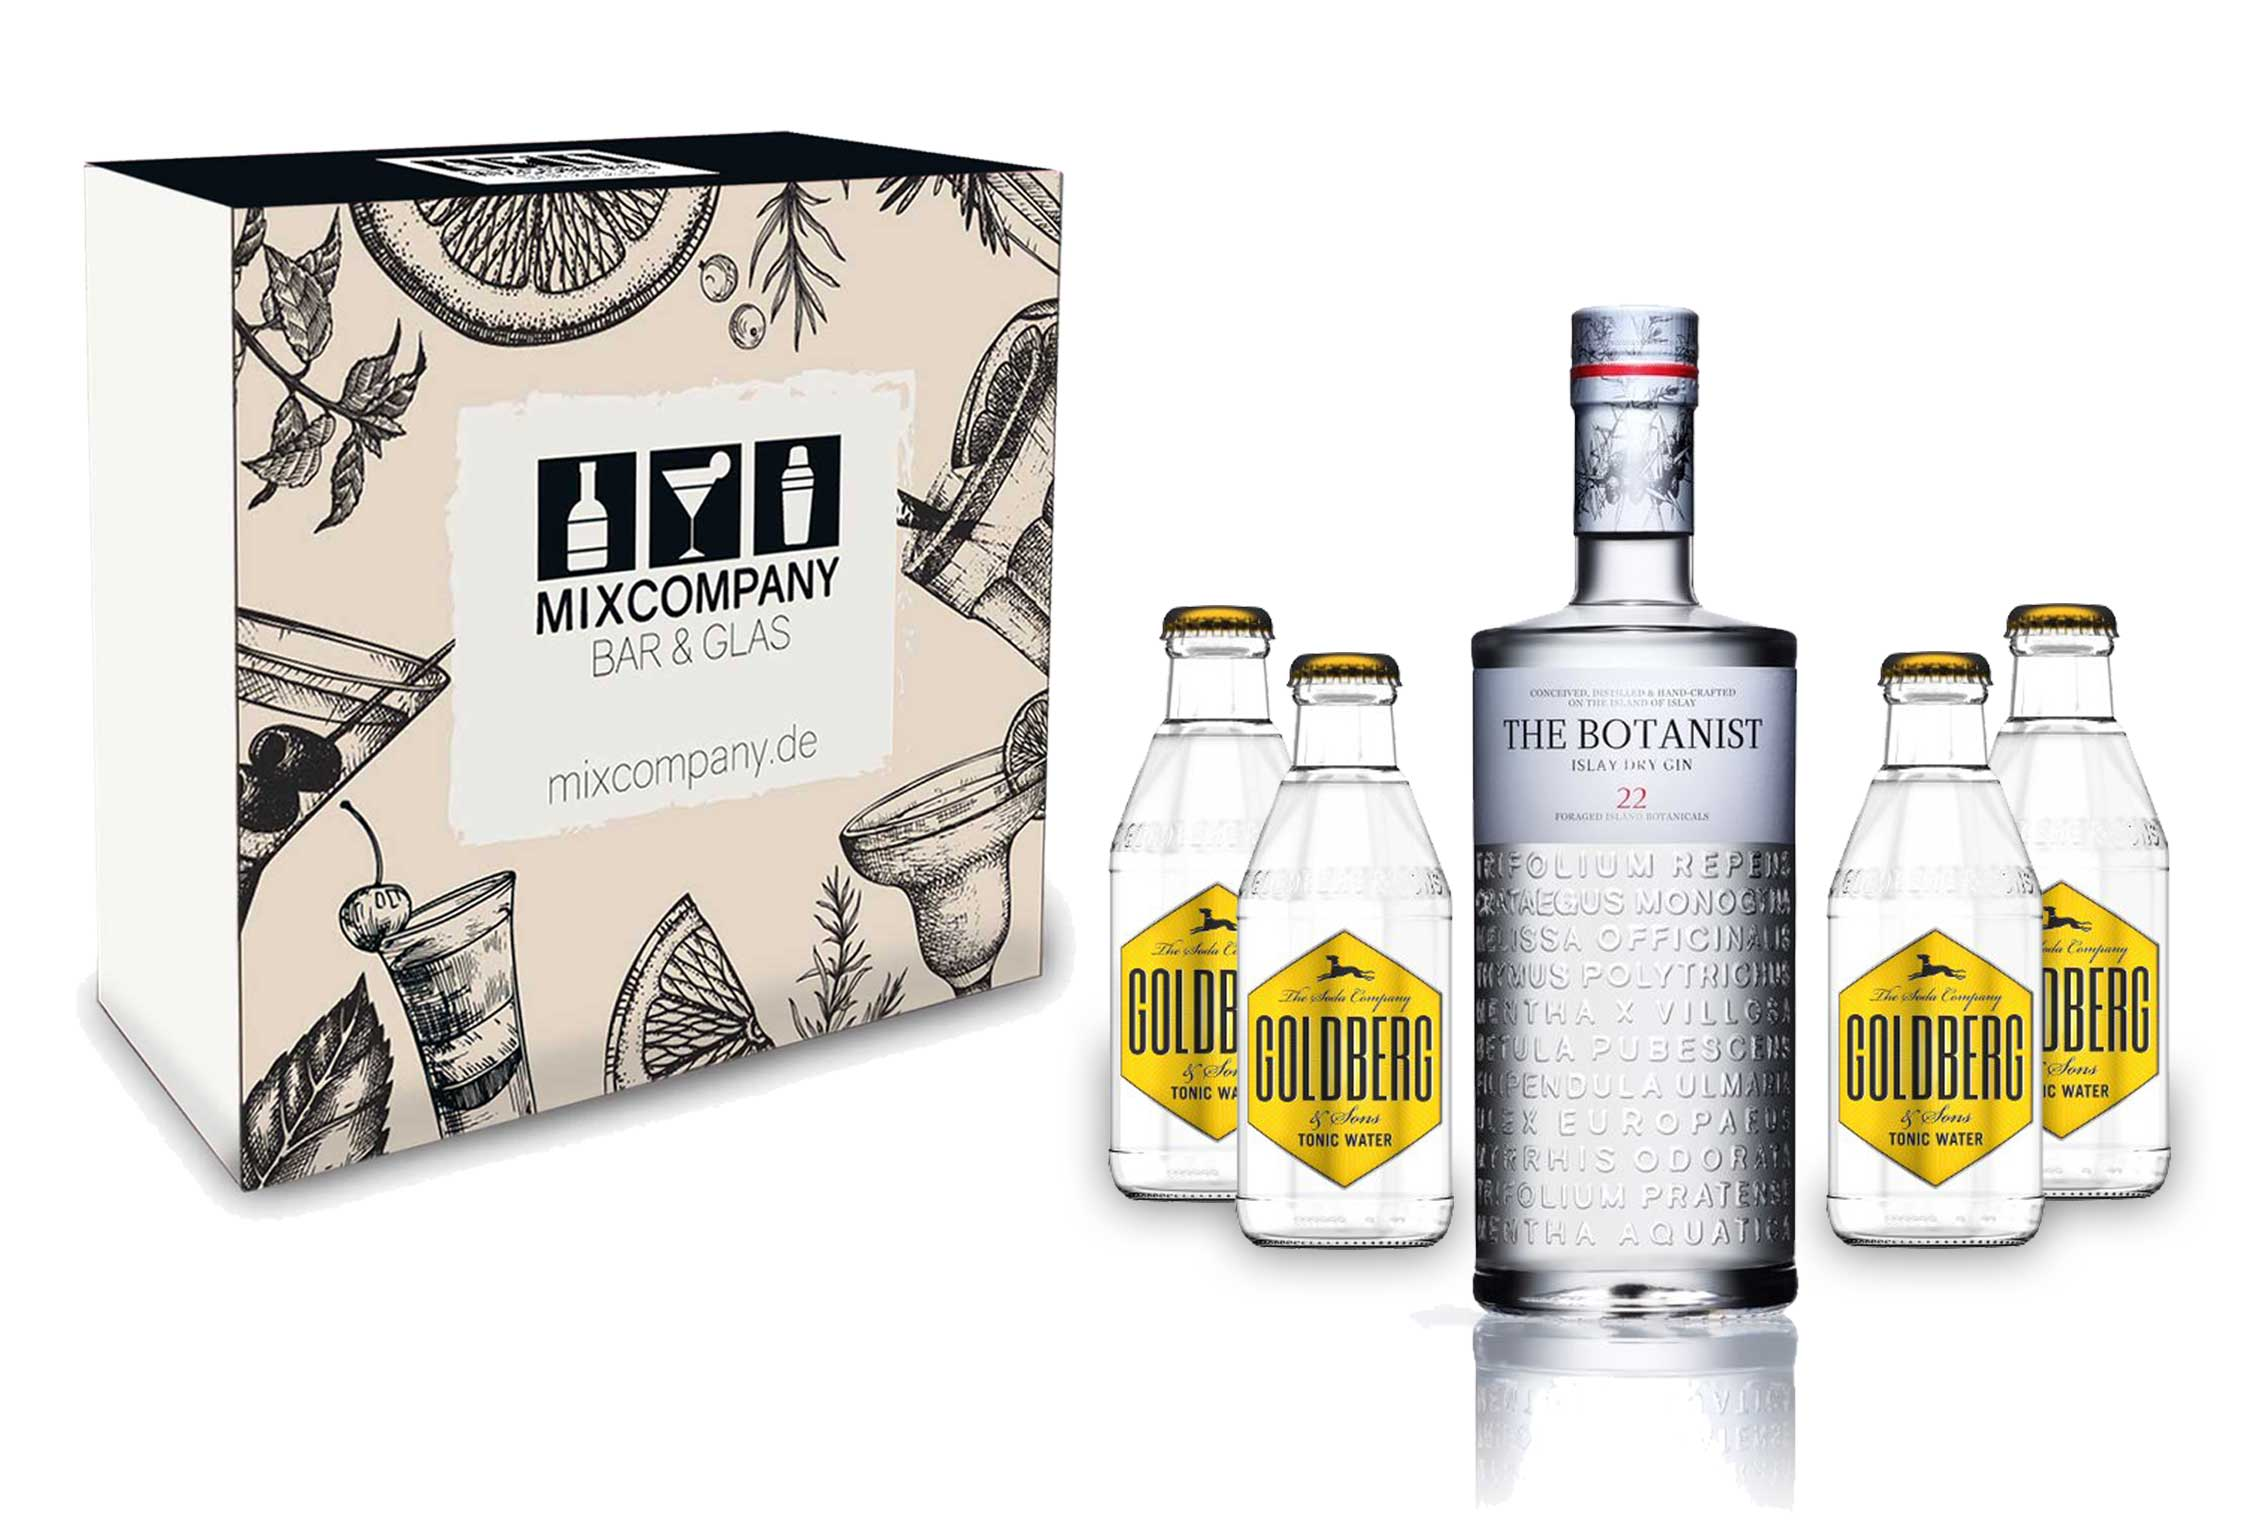 Gin Tonic Giftbox Geschenkset - The Botanist Islay Dry Gin 0,7l 700ml (46% Vol) + 4x Goldberg Tonic Water 200ml inkl. Pfand MEHRWEG + Geschenkverpackung